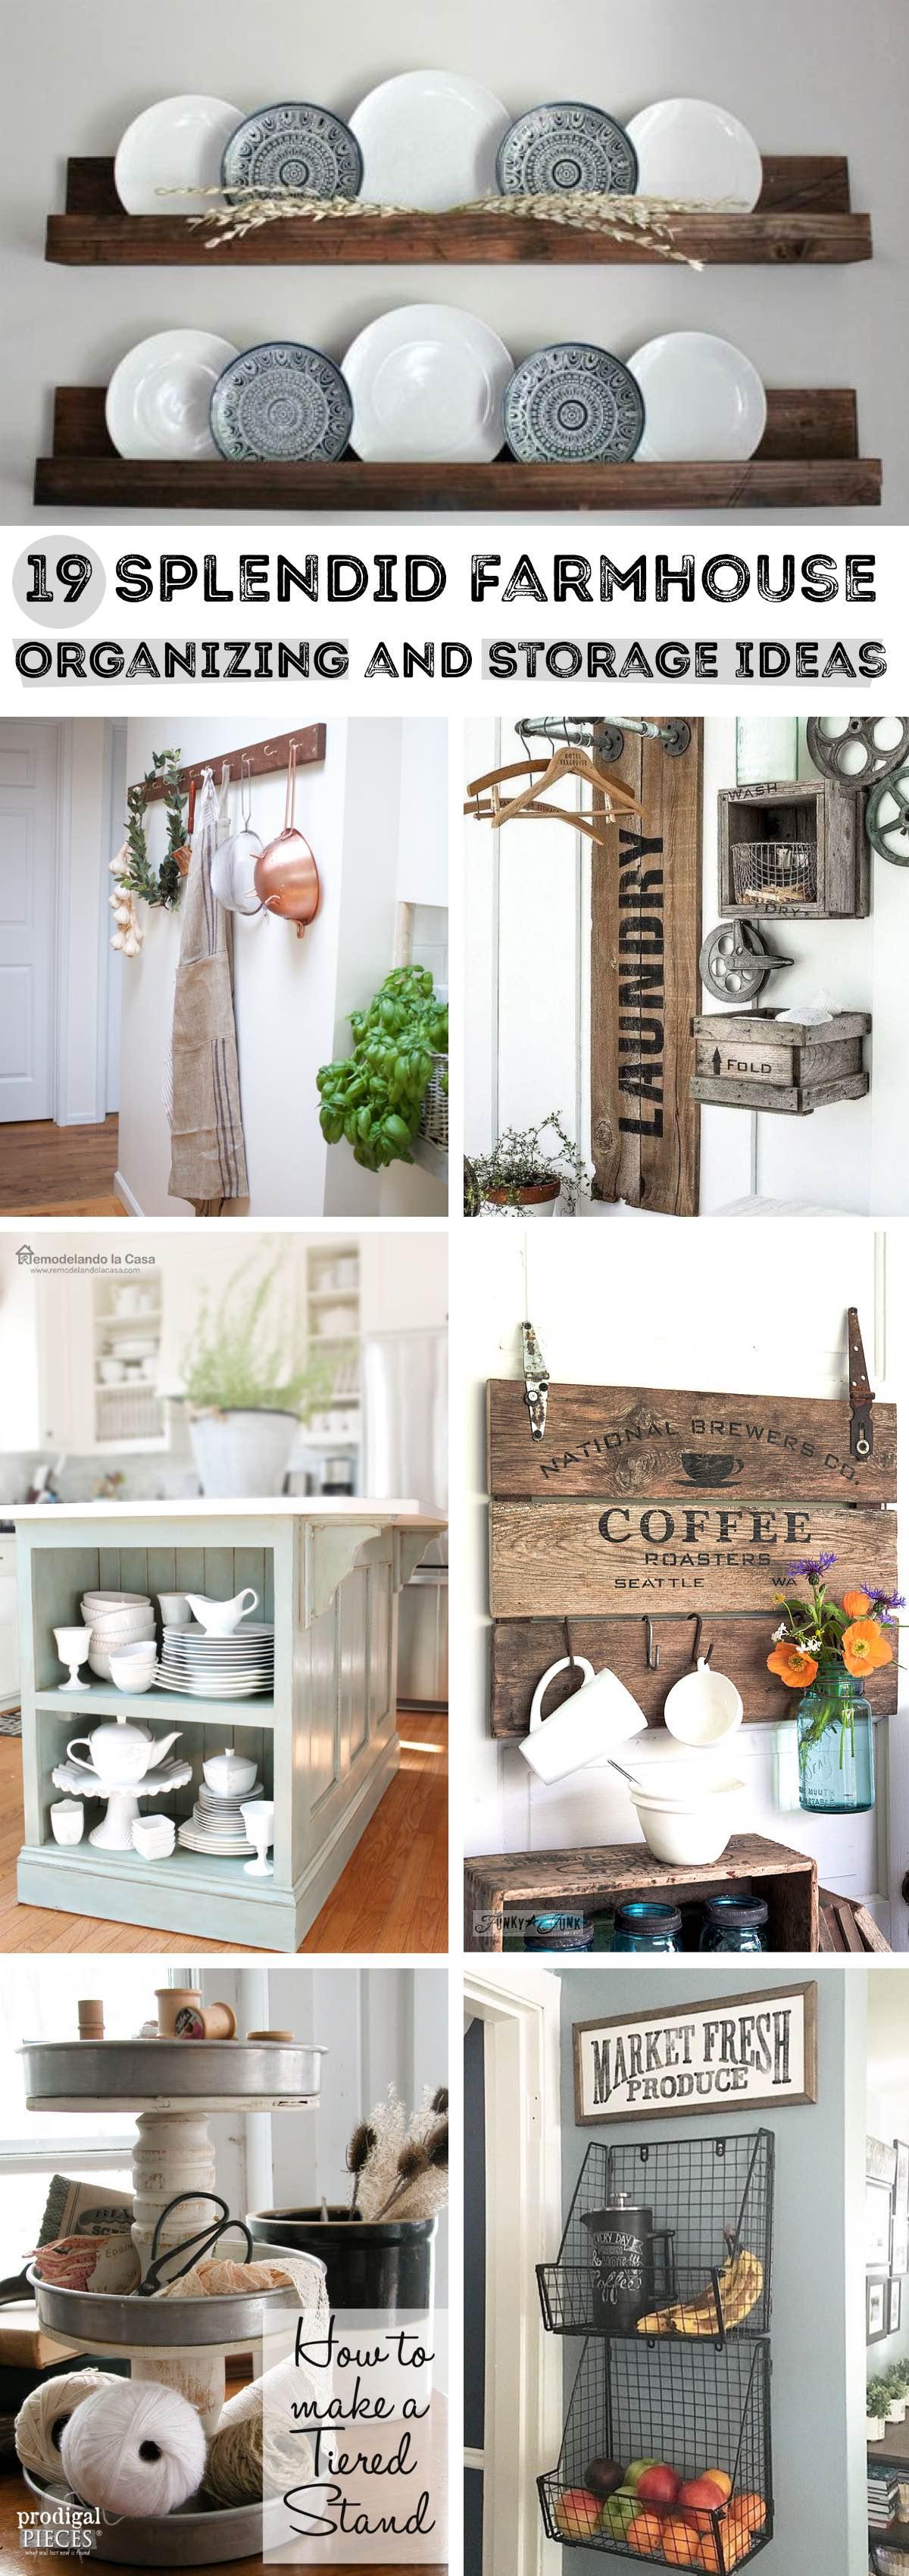 19 Splendid Farmhouse Organizing and Storage Ideas